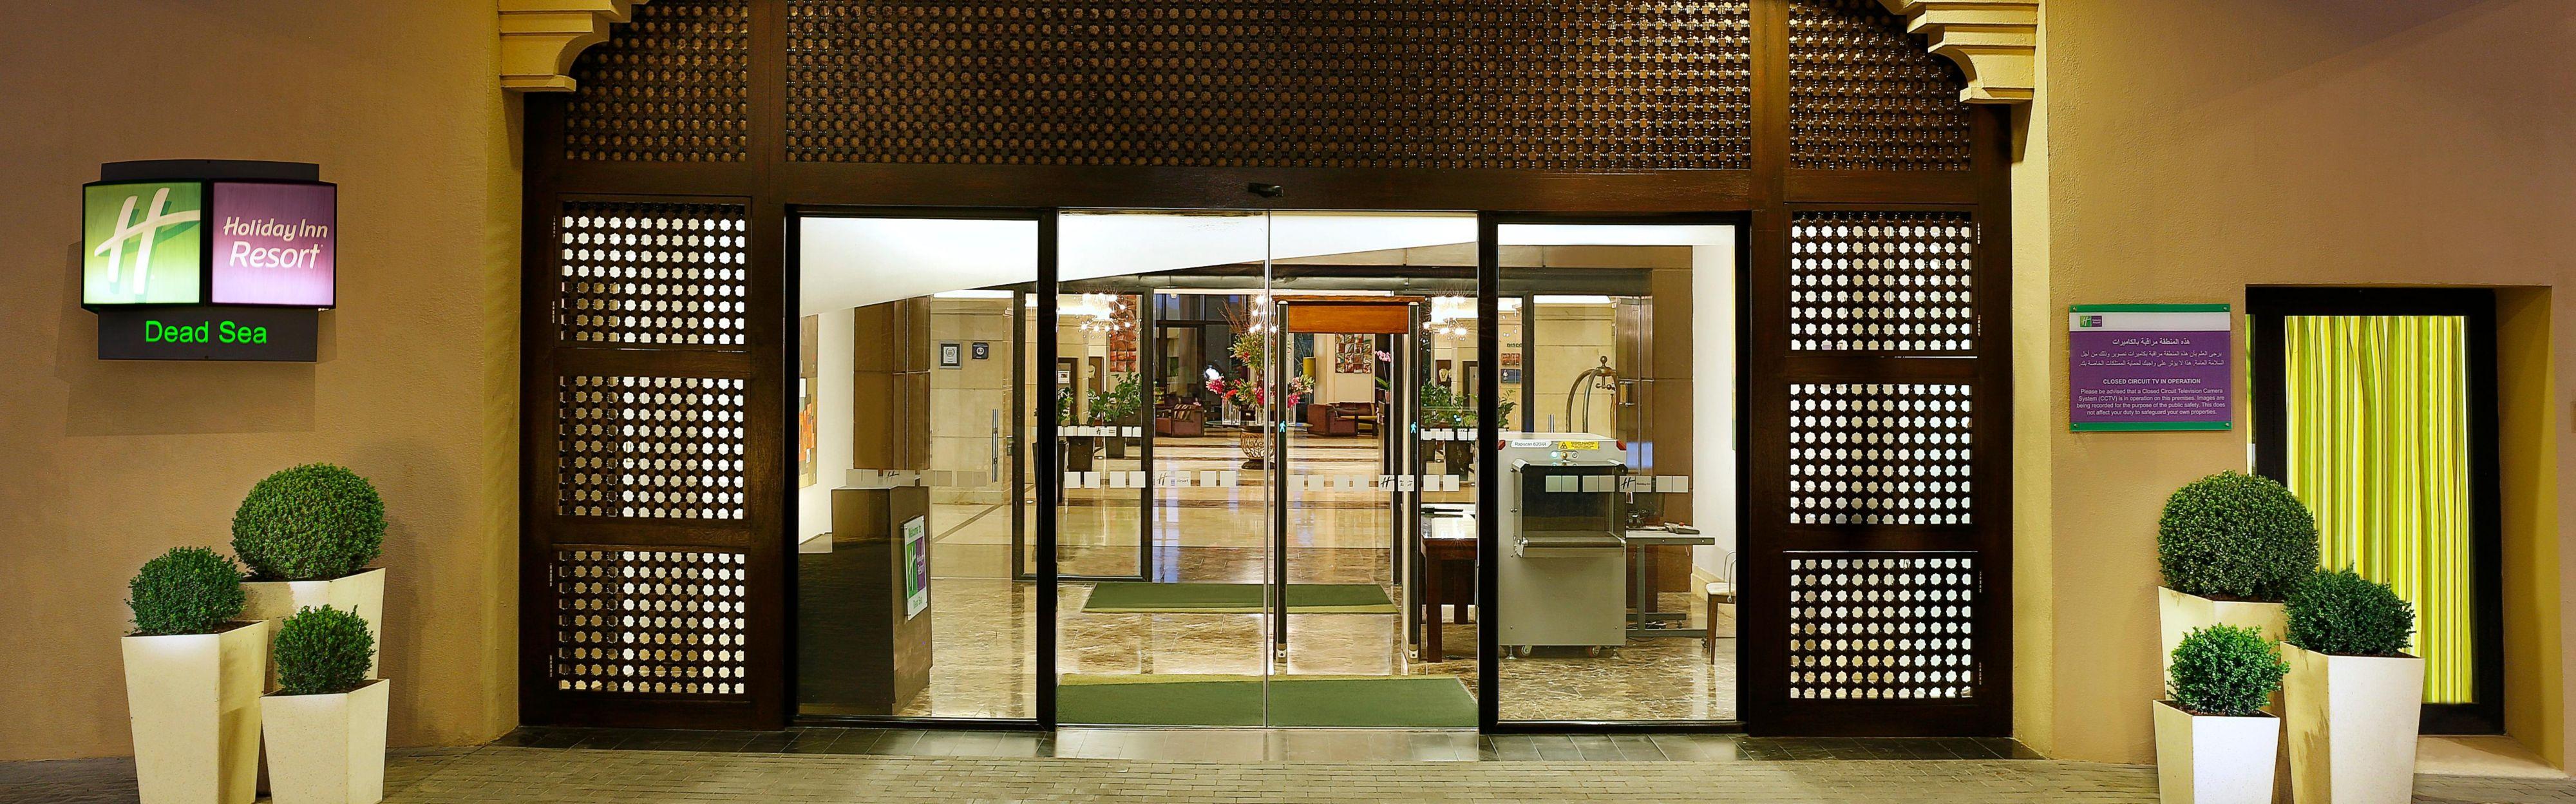 Holiday Inn Resort Dead Sea Hotel by IHG